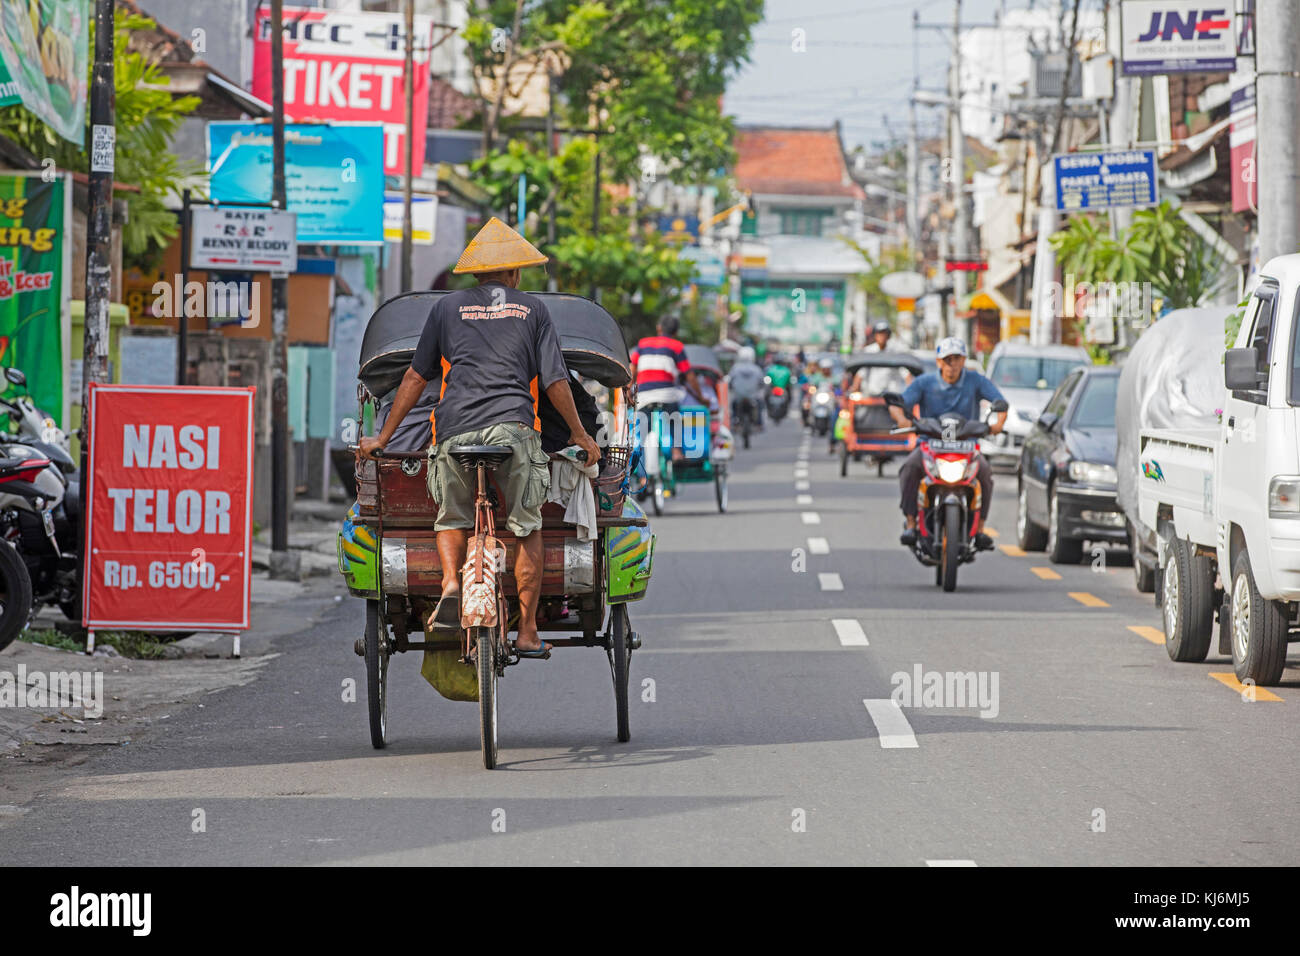 Cycle rickshaws / becak for public transport in the city Yogyakarta, Java, Indonesia - Stock Image